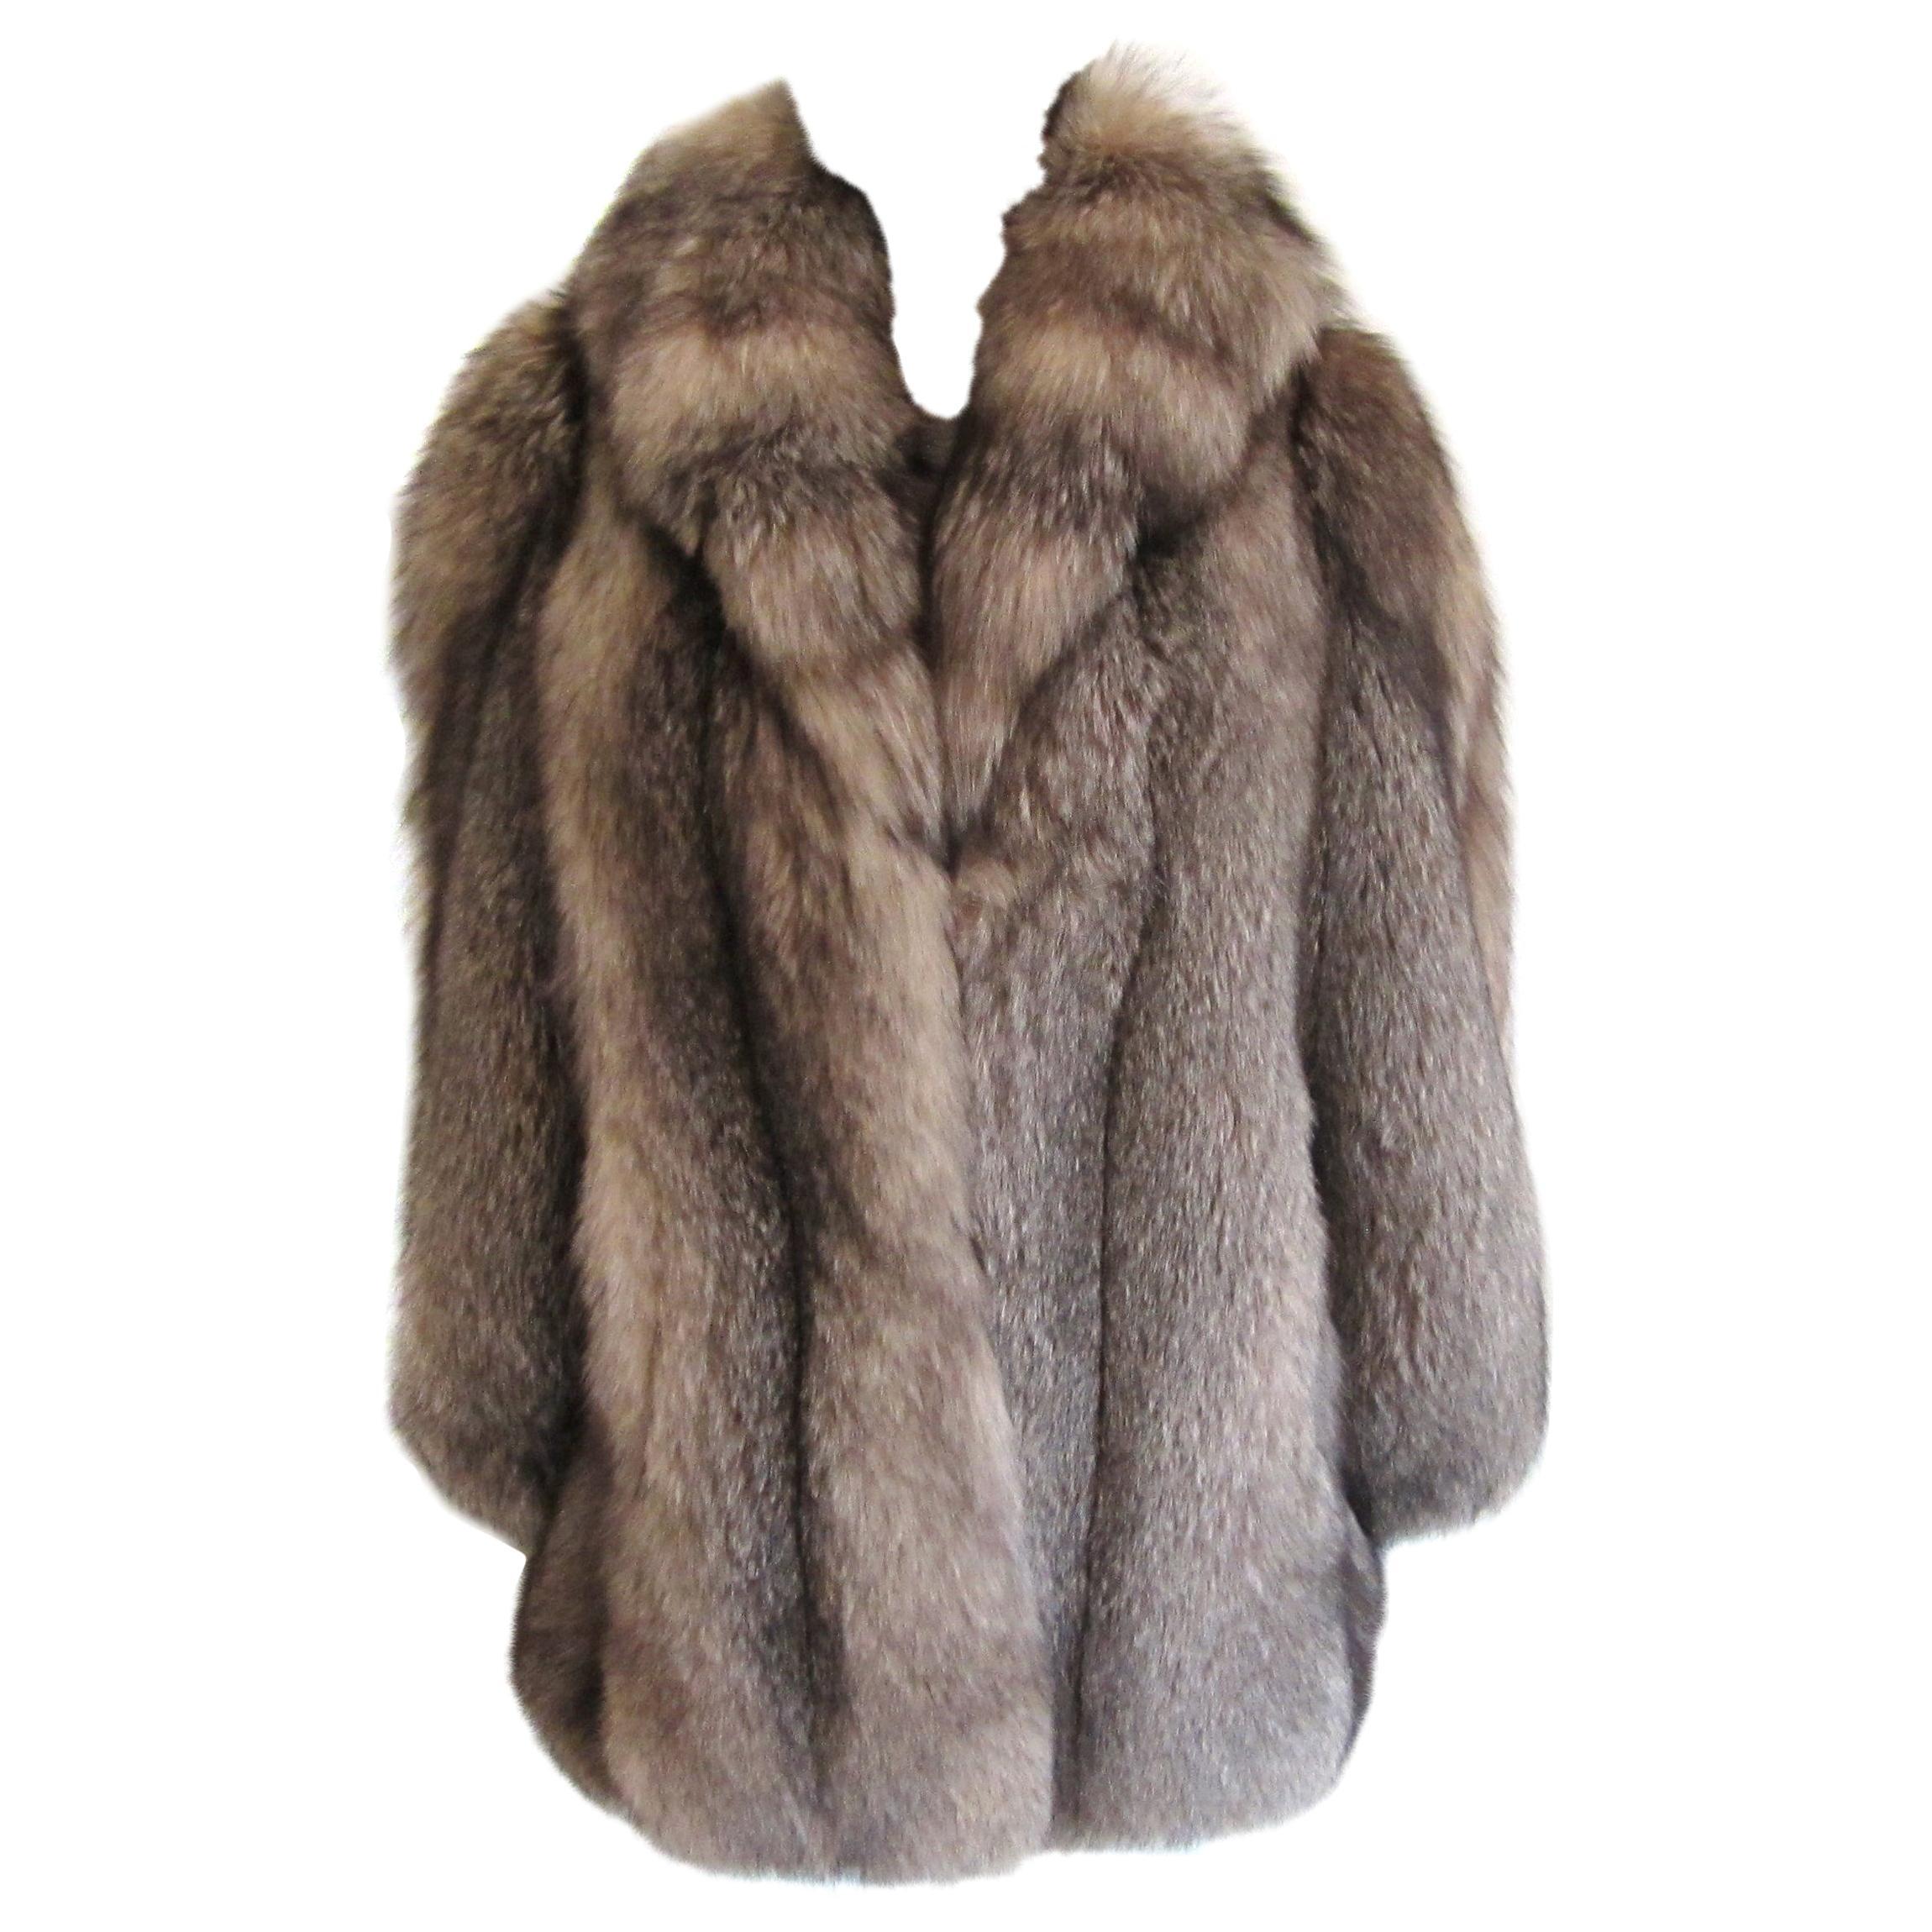 Black & Silver Tipped Fox Fur Coat Stunning